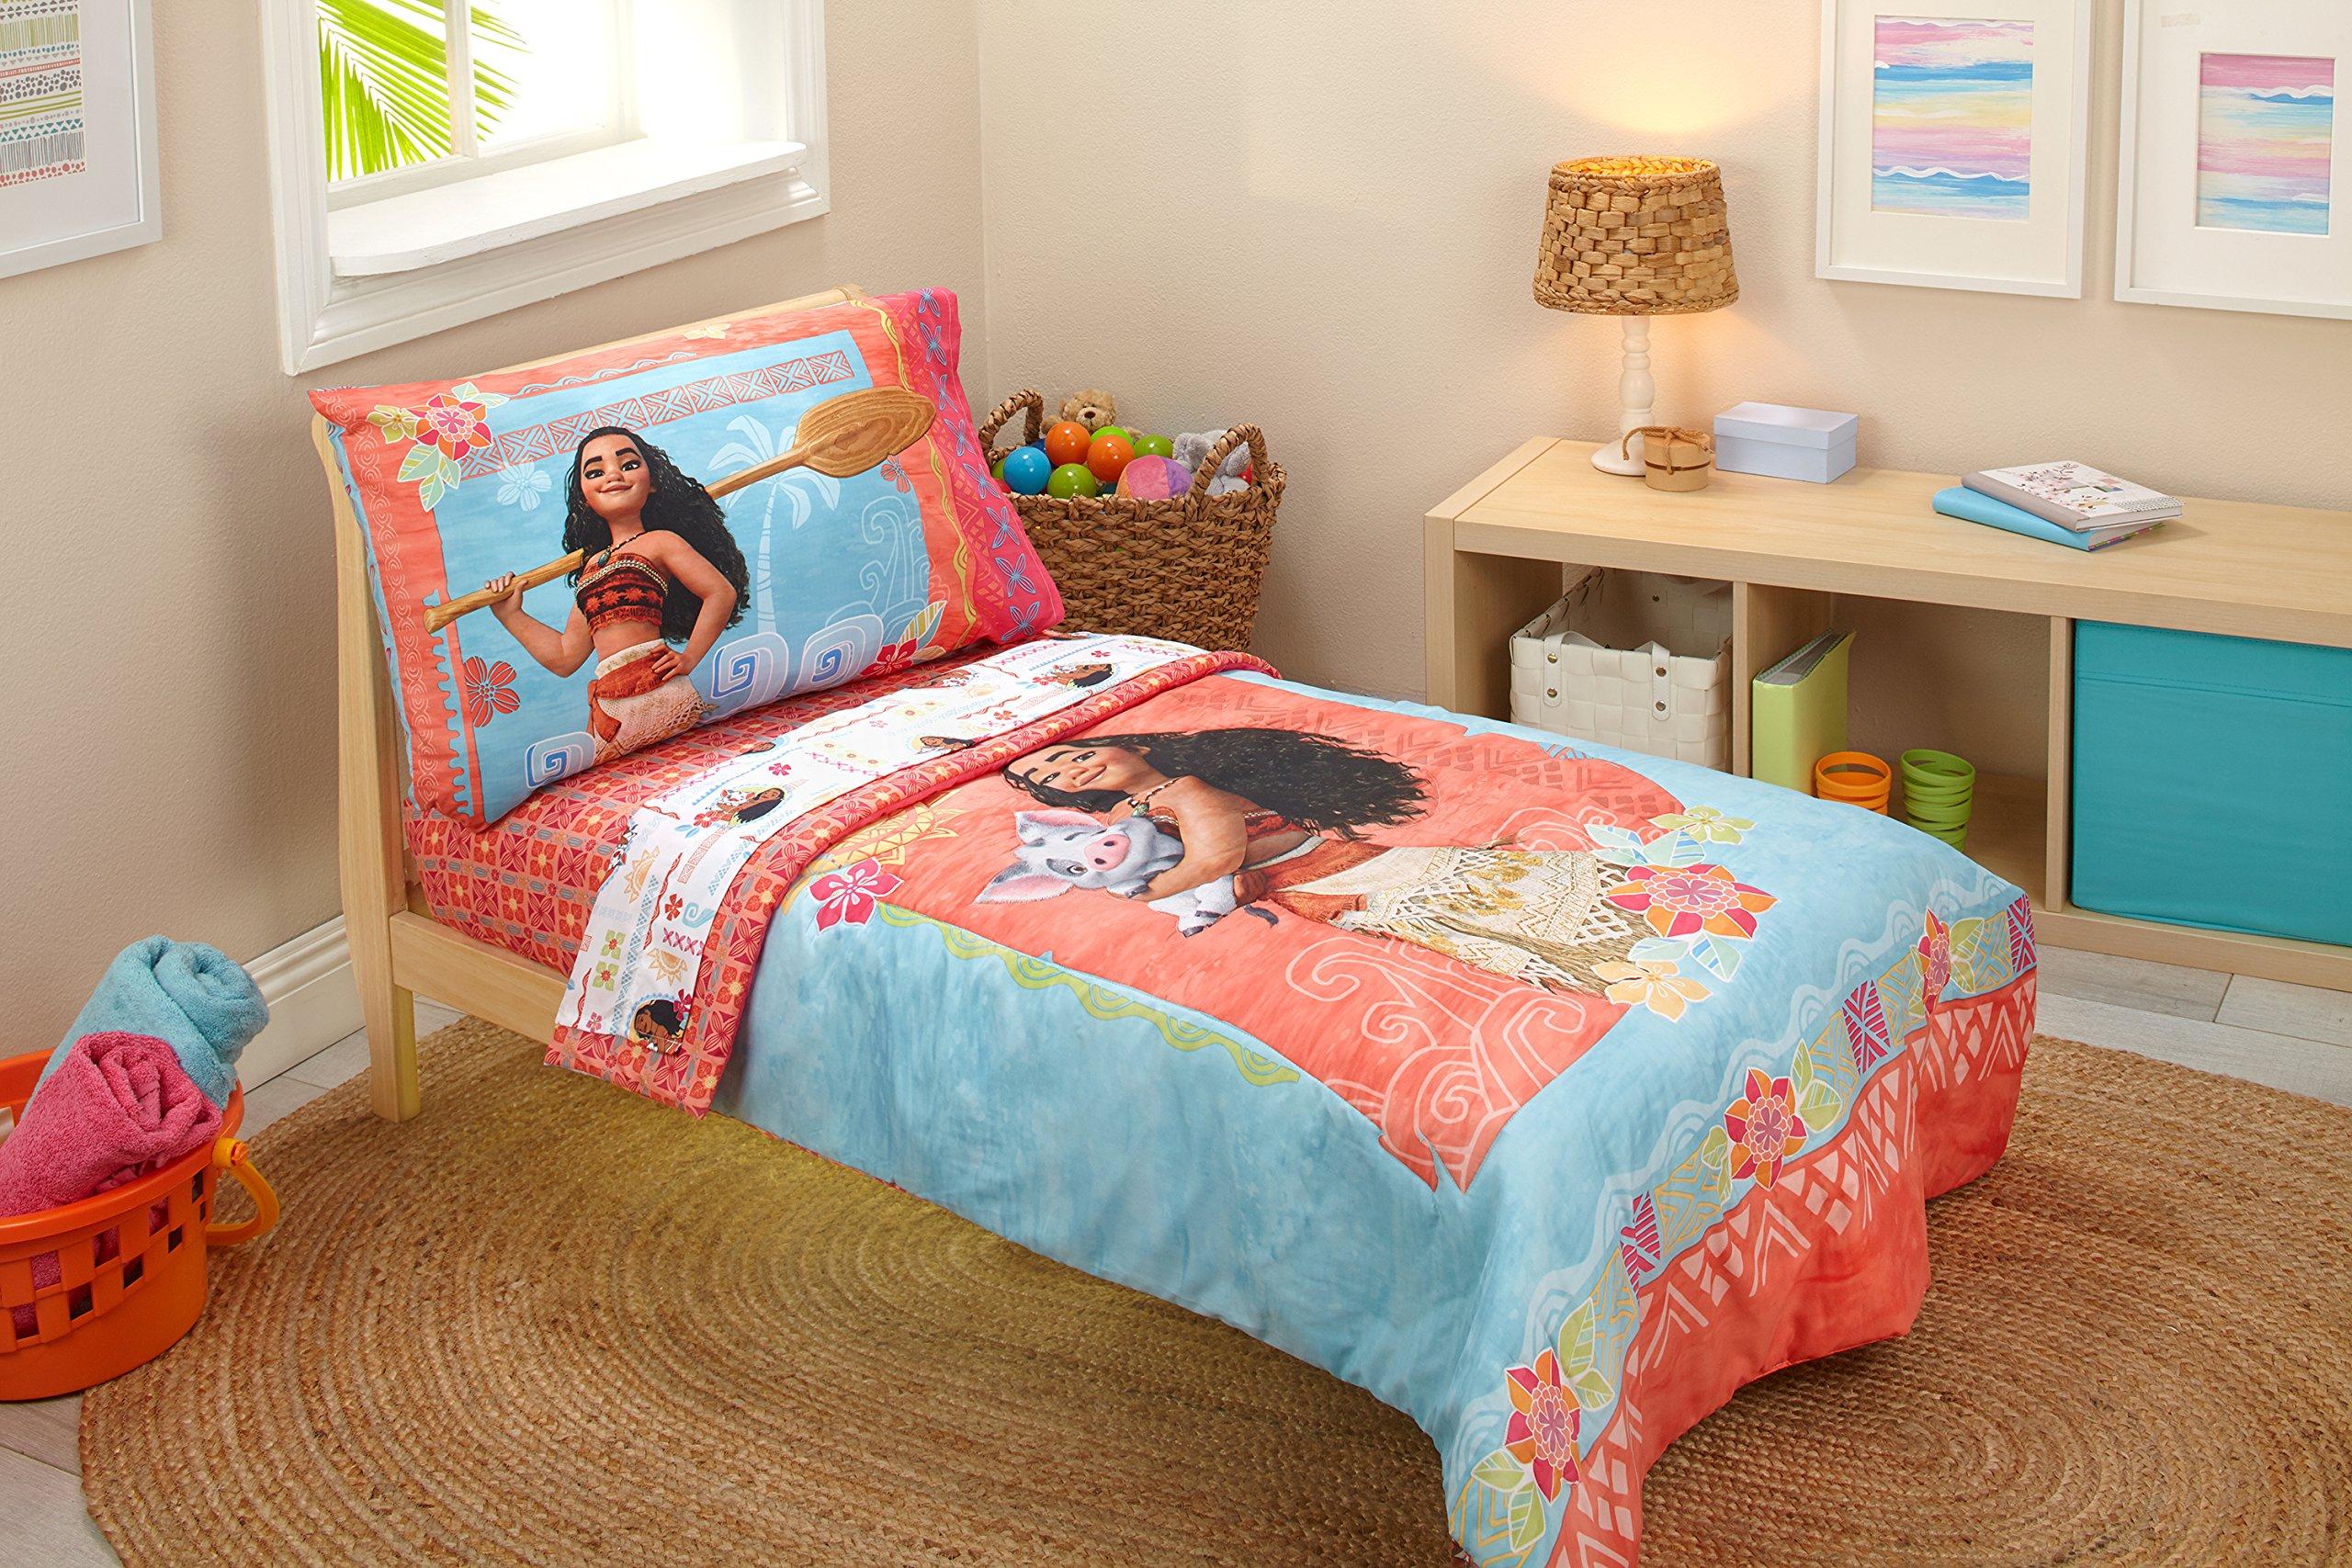 Disney Moana Toddler 4 Piece Bedding Set by Disney